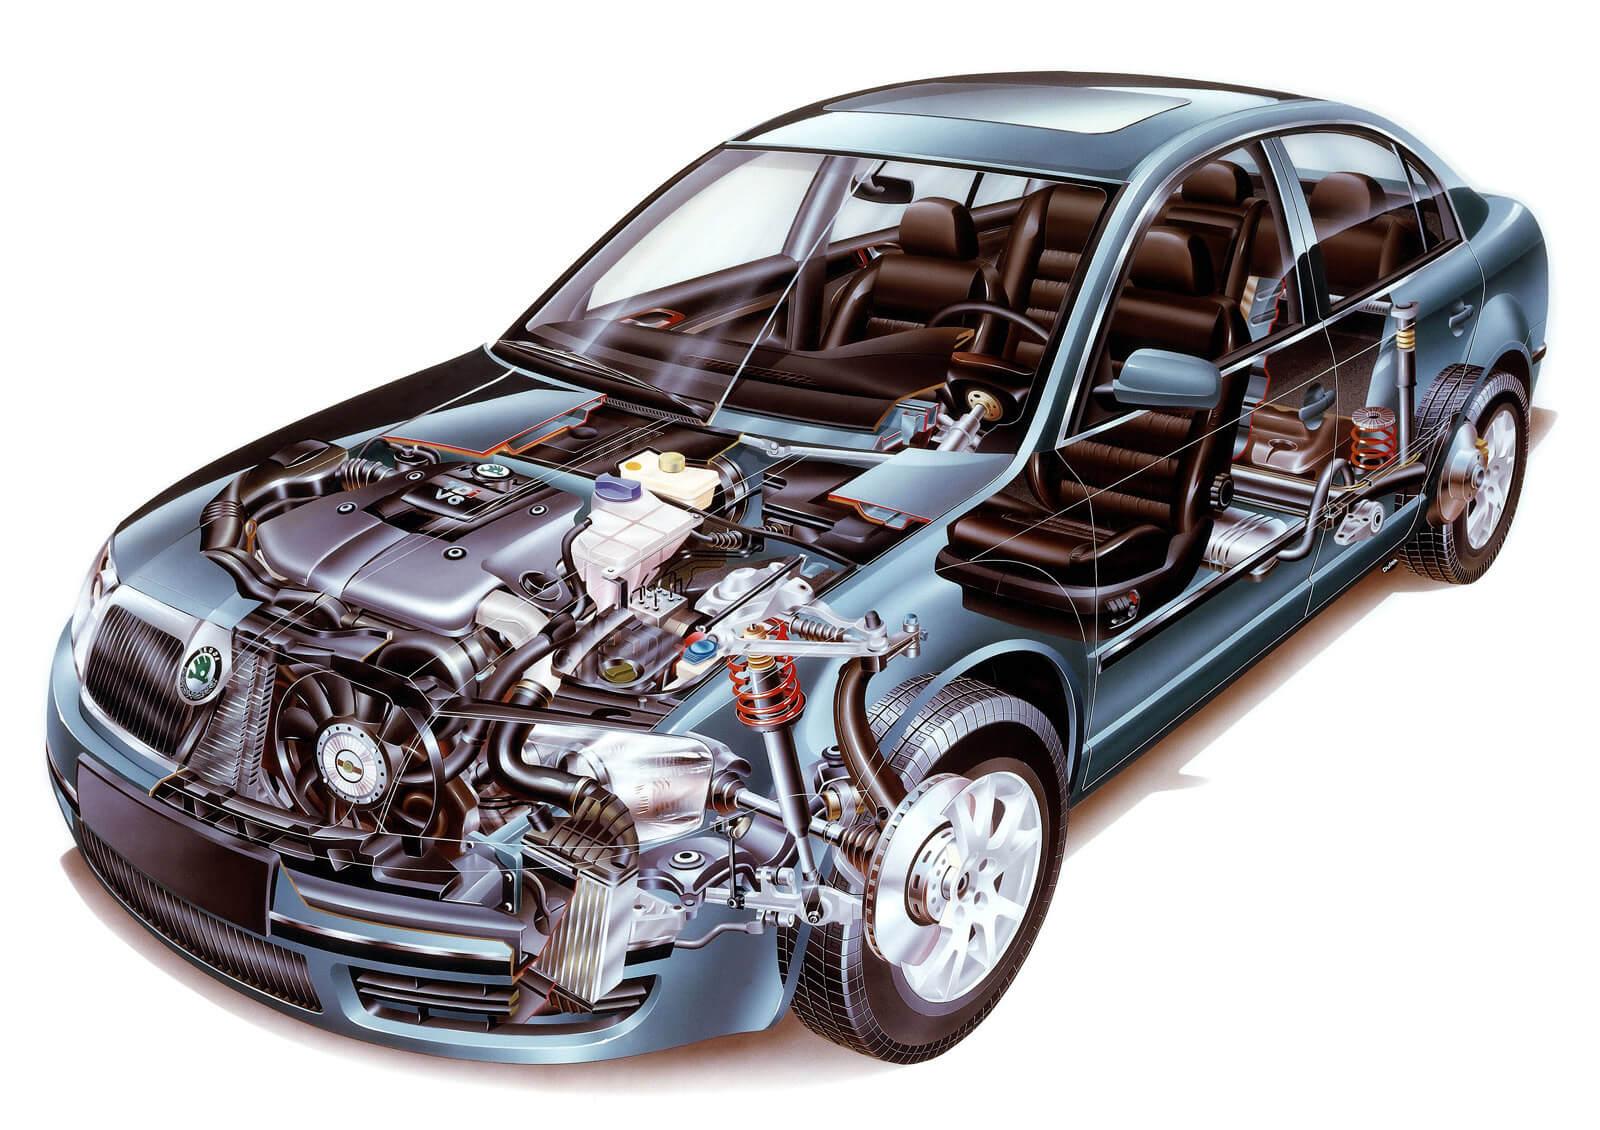 Диагностика автомобиля в Гомеле - СТО М-Мастер